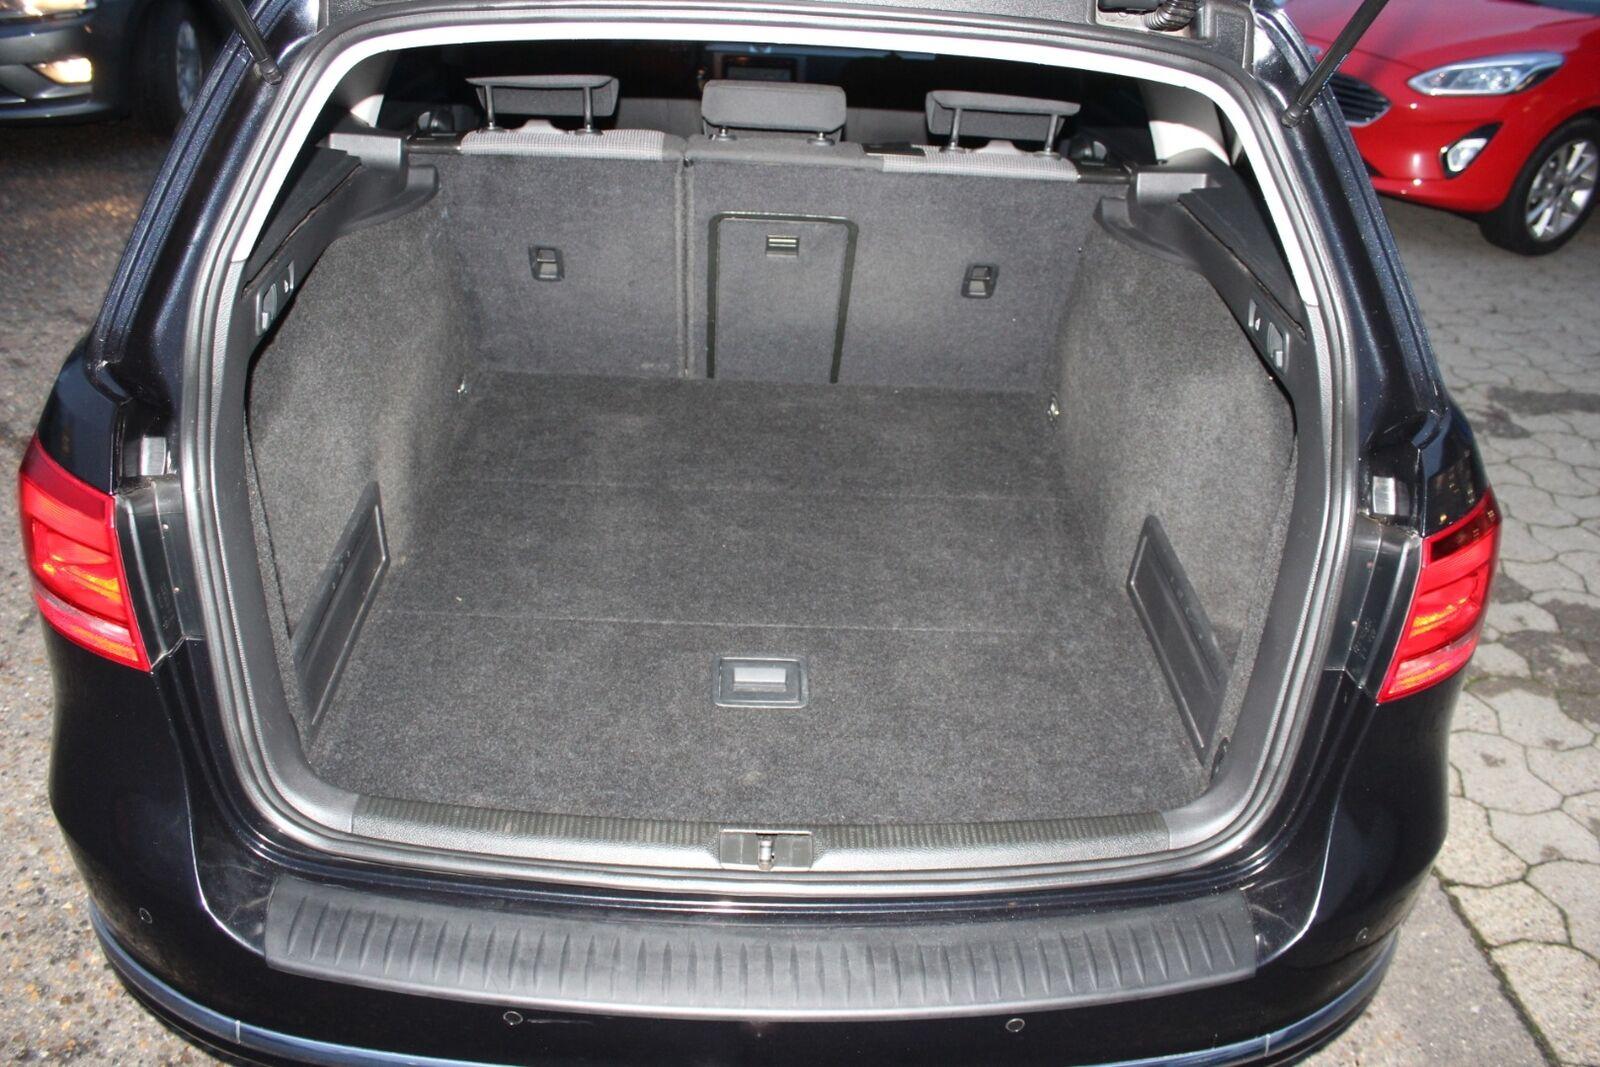 VW Passat 2,0 TDi 140 Comfortl. Vari. BMT - billede 6